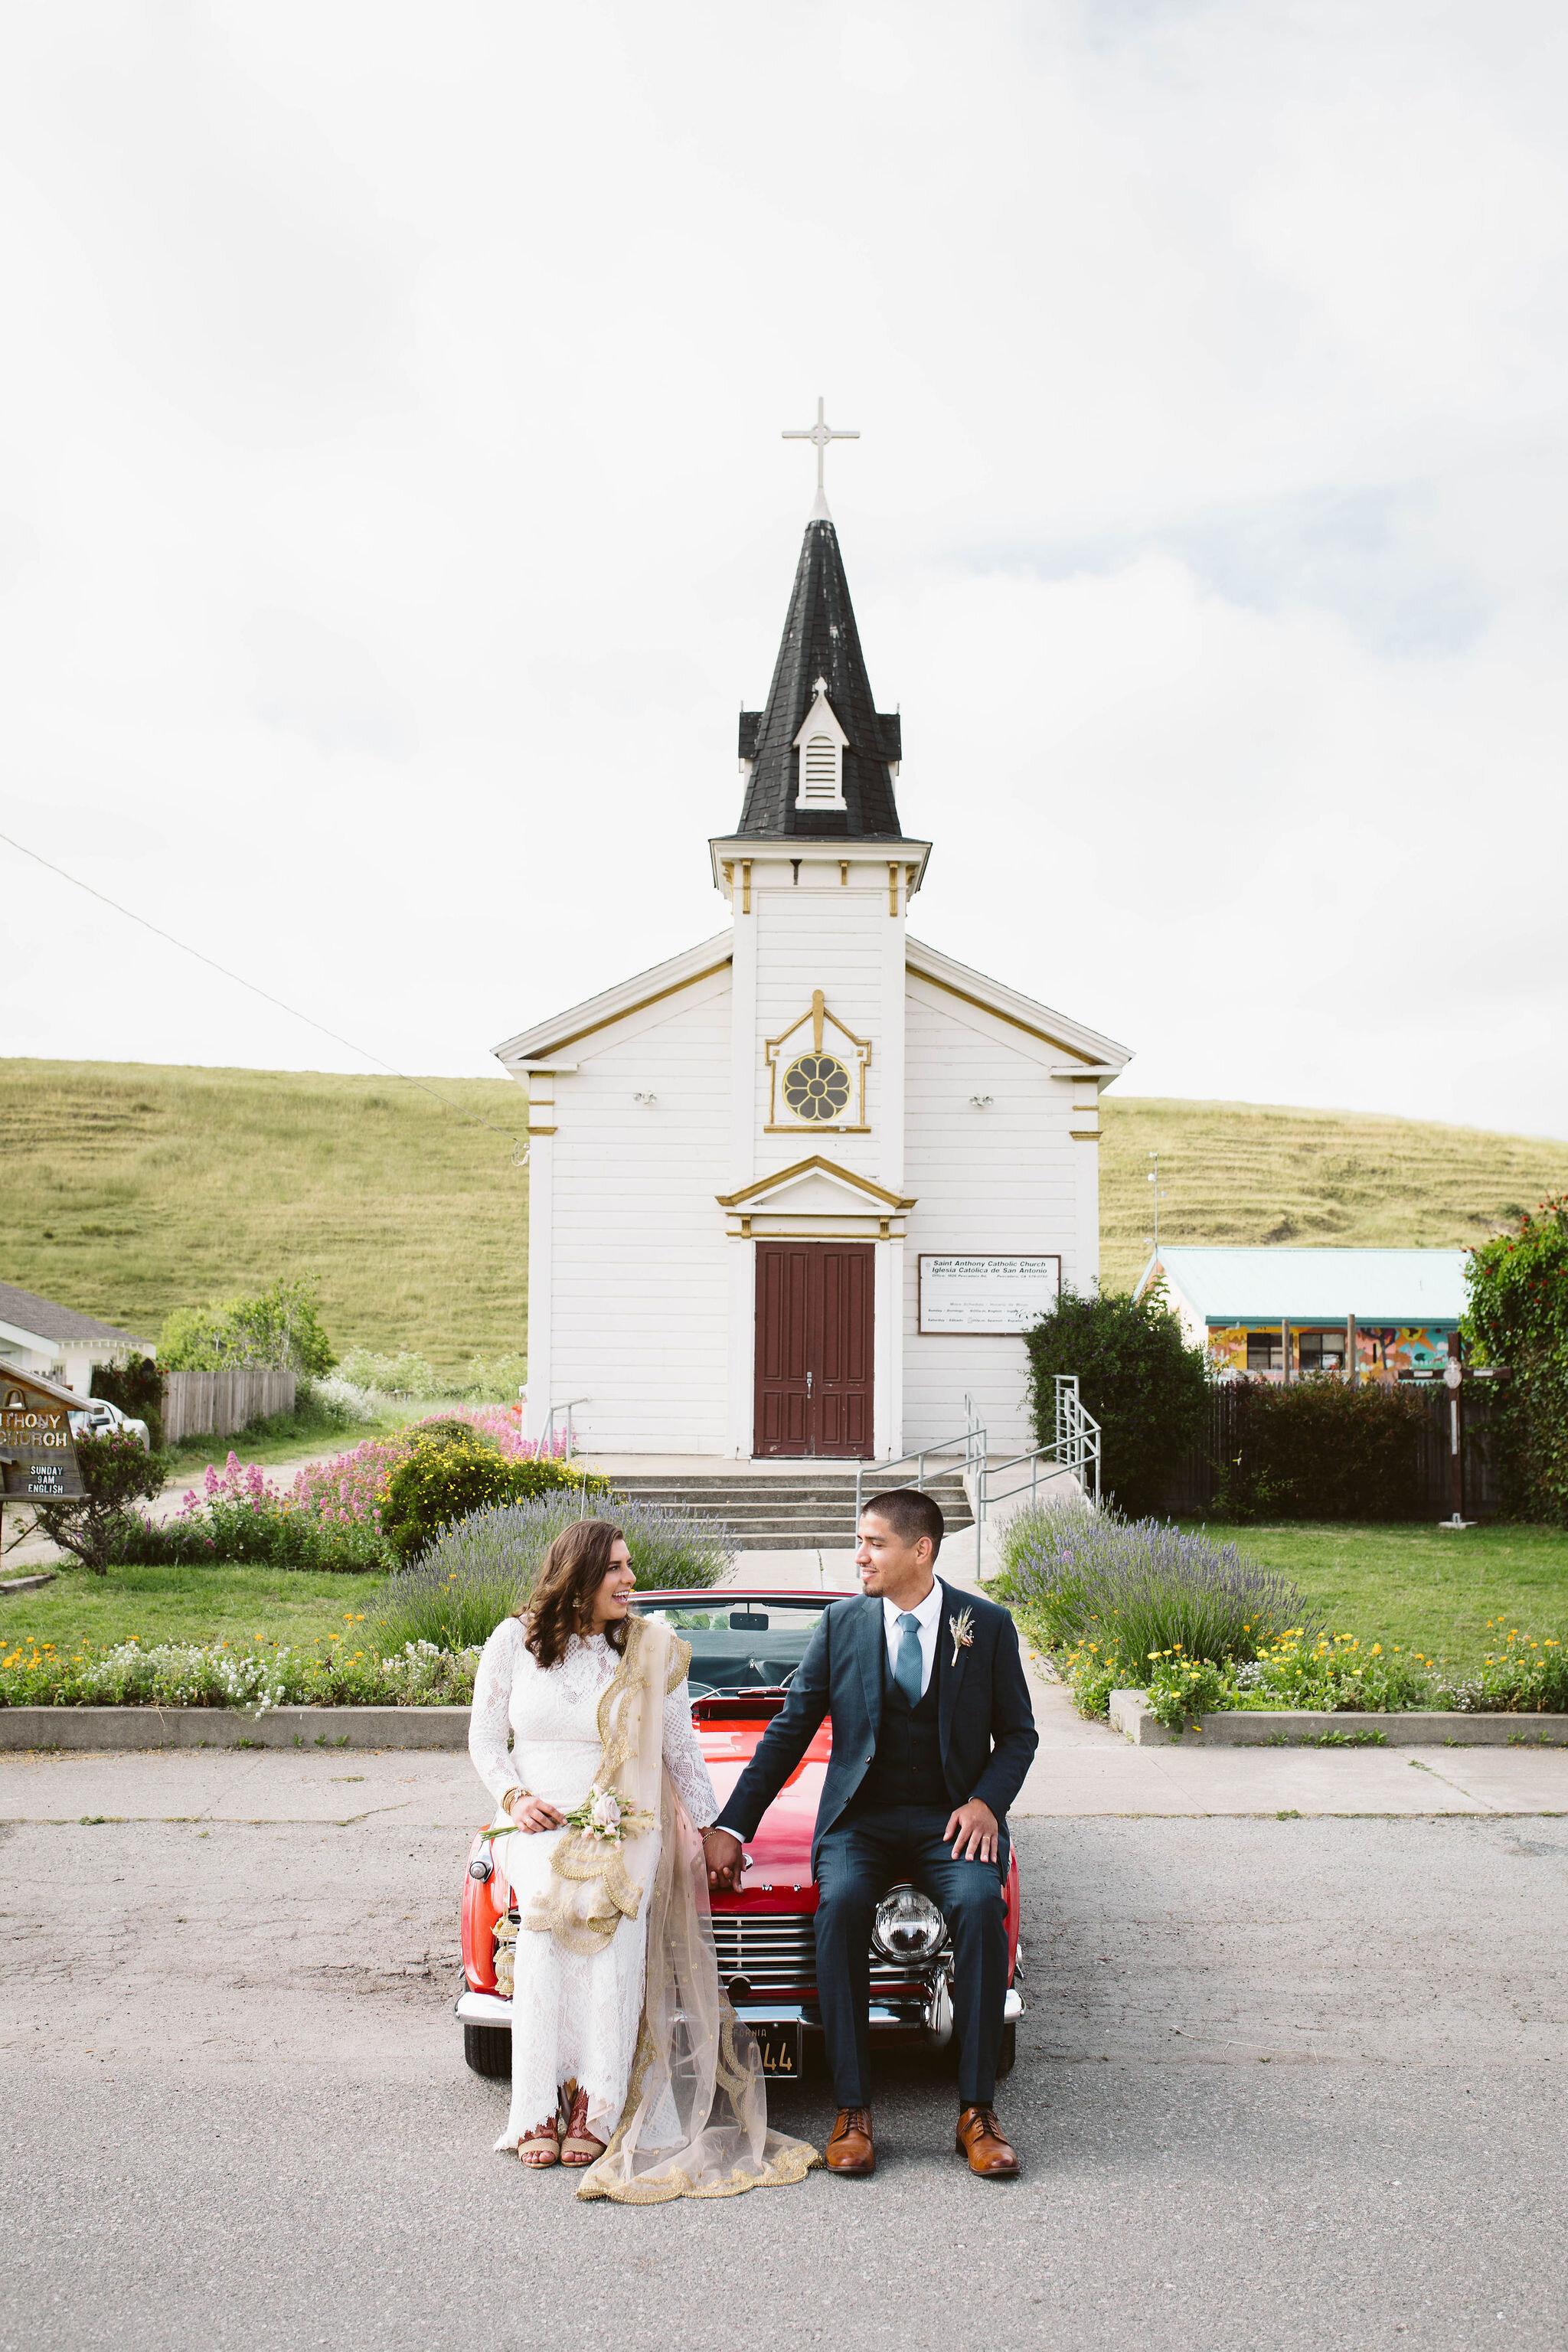 Venture-Retreat-Center-Wedding-Pescadero-Sat-Aaron-Pritam-The-Shalom-Imaginative-386.jpg